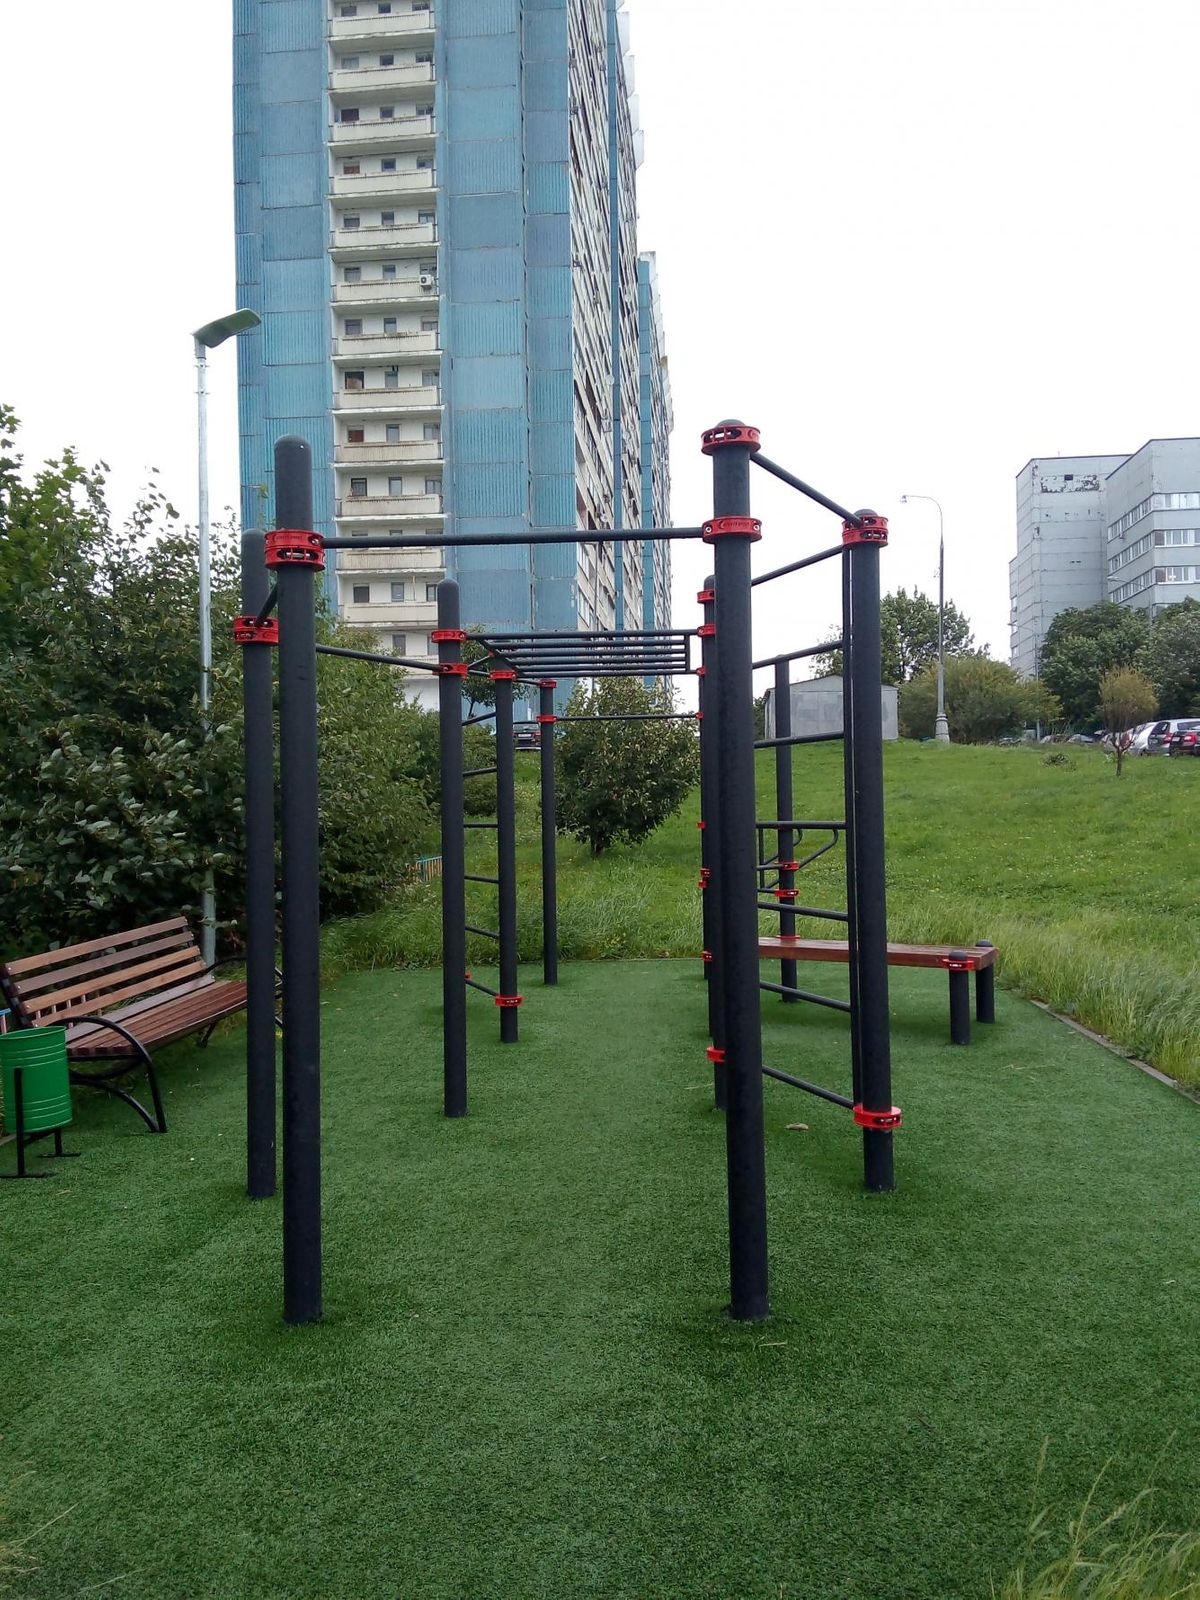 Moscow - Calisthenics Gym - Ясногорская Улица